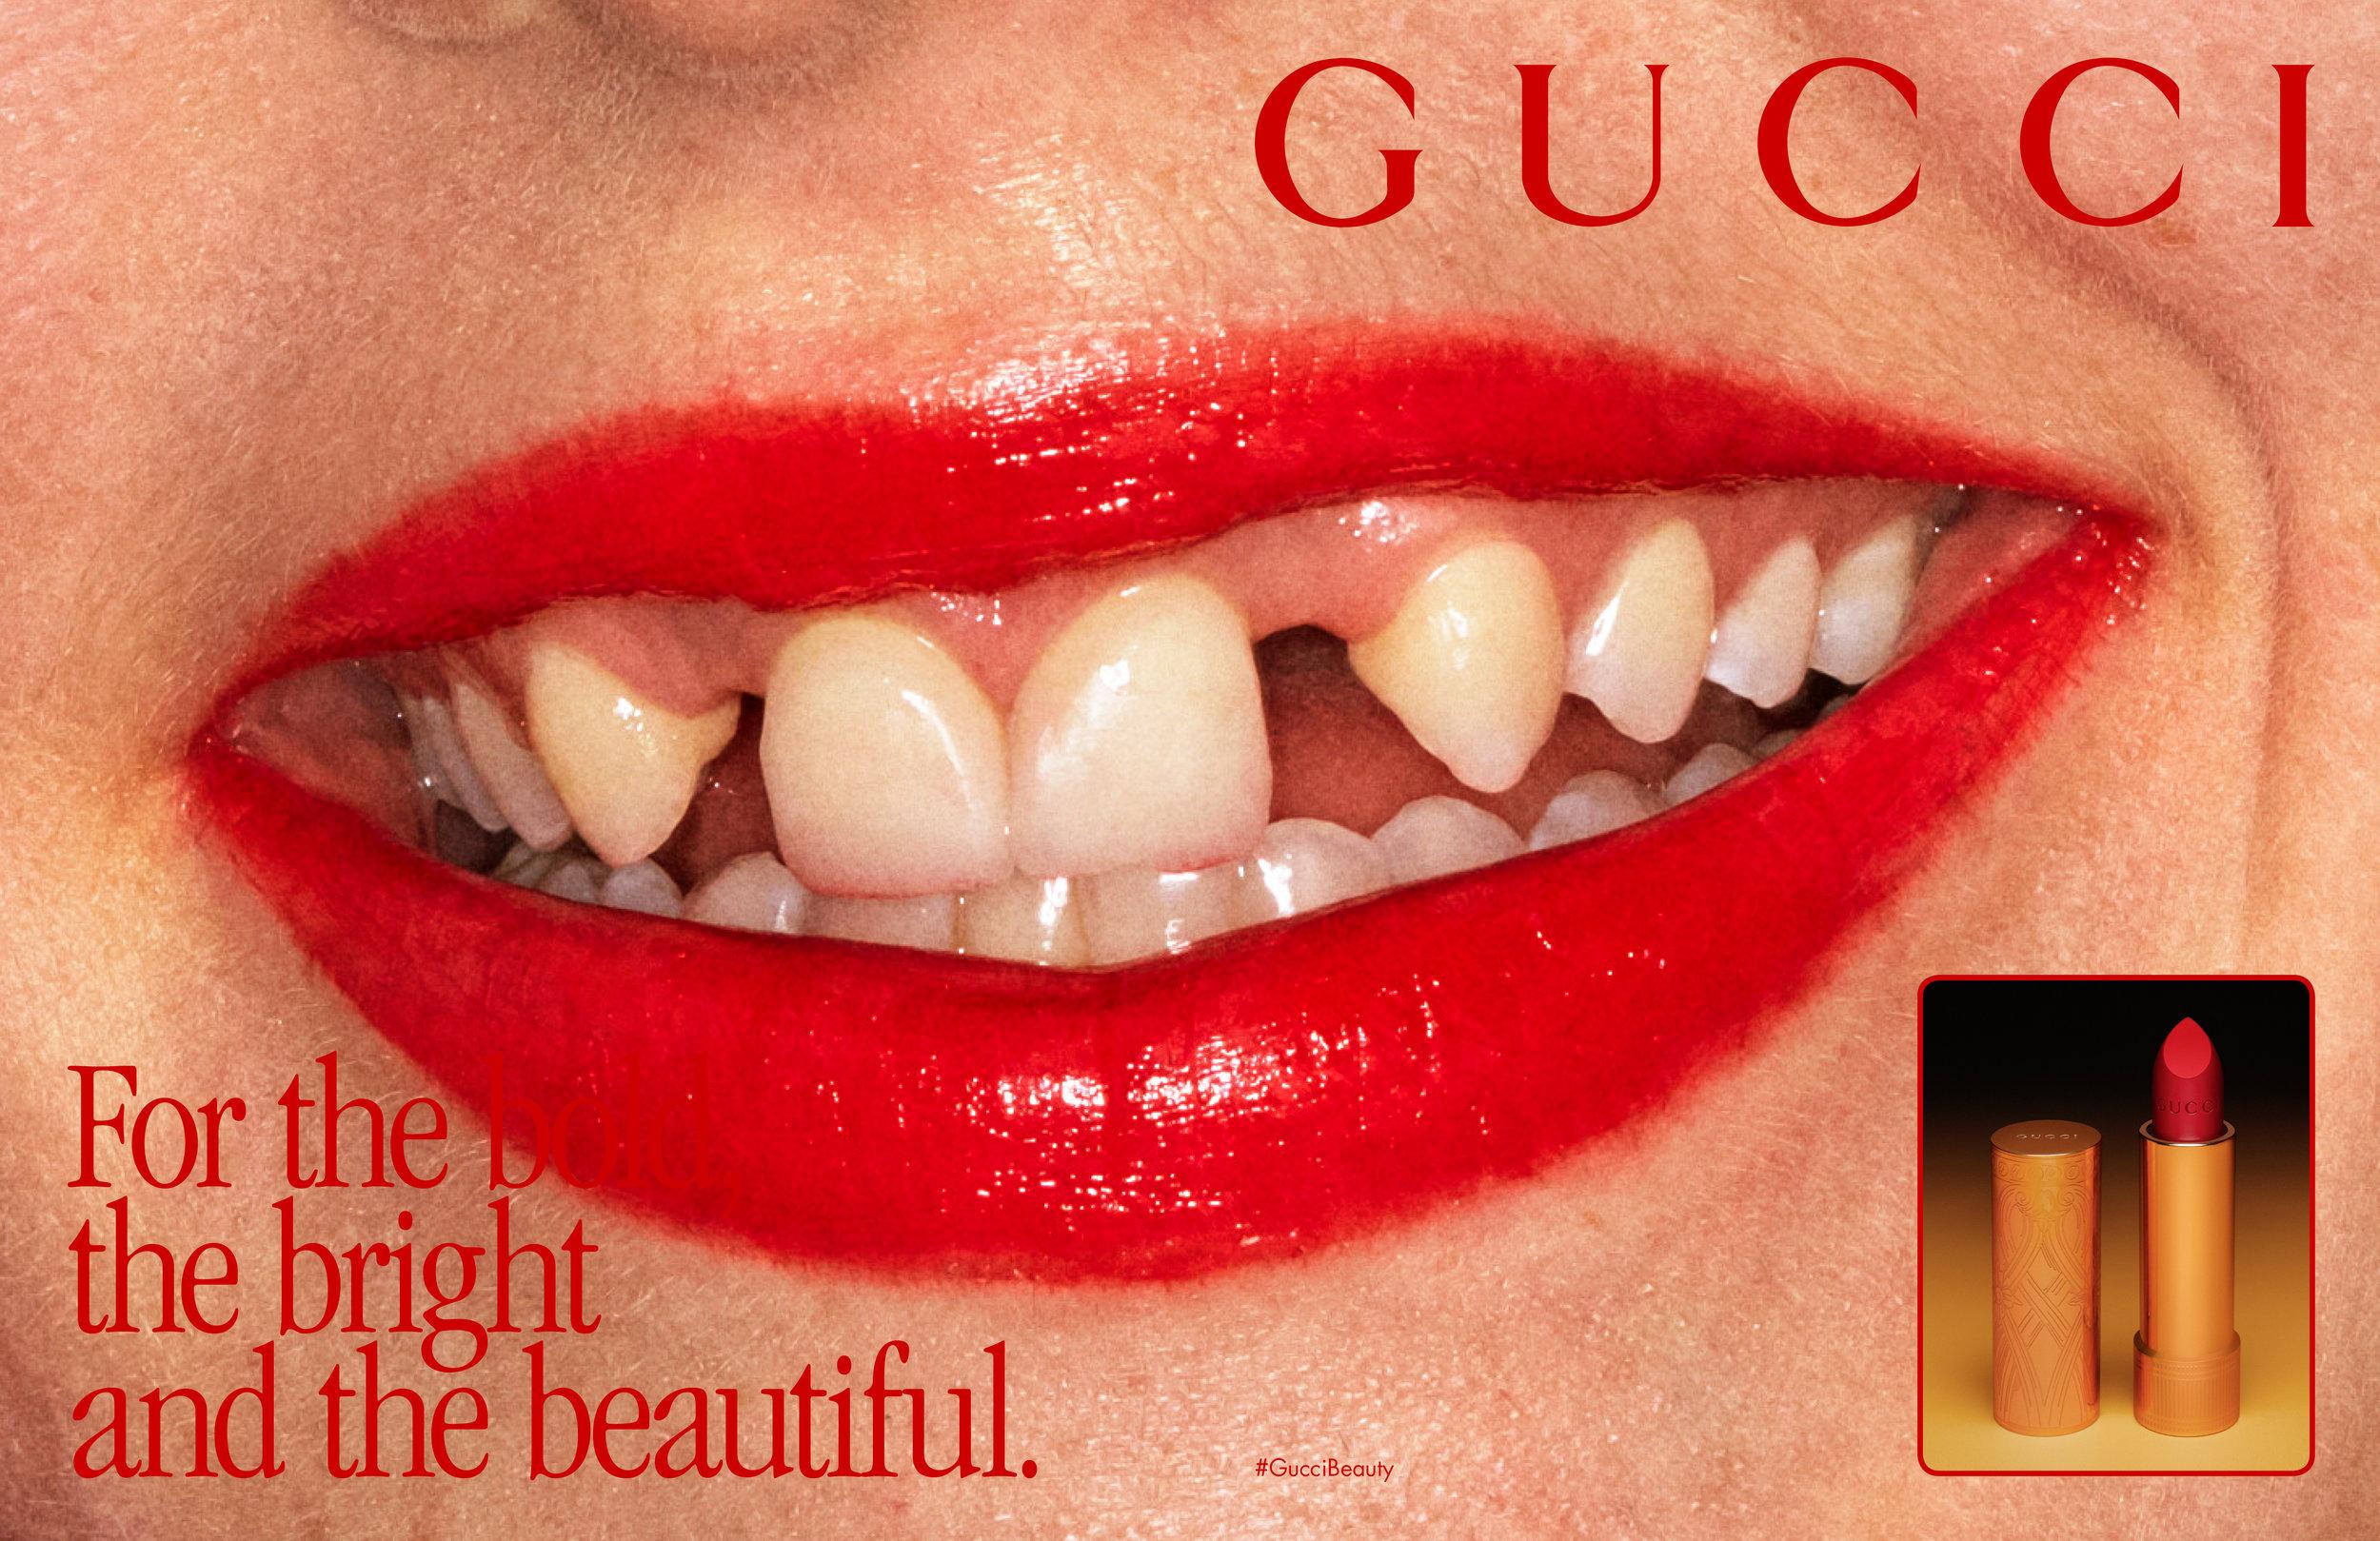 Gucci's new makeup campaign 2019.